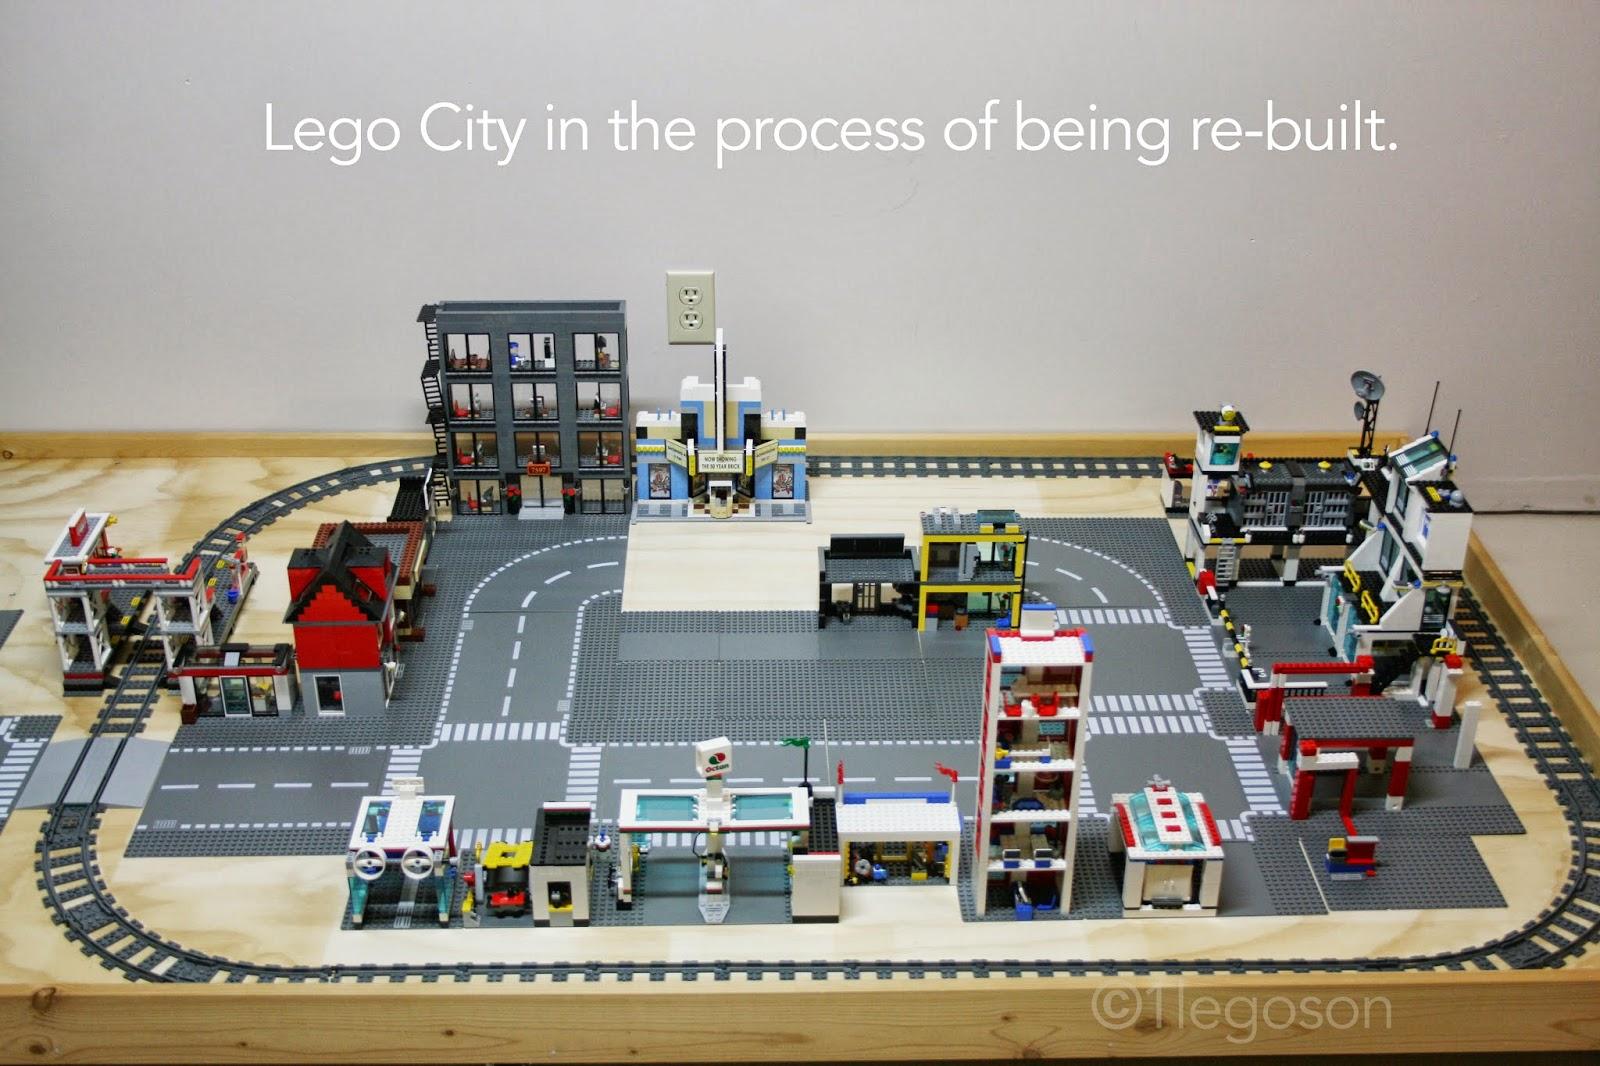 Lego City Garage : Legoson creates lego city the gas station garage and car wash